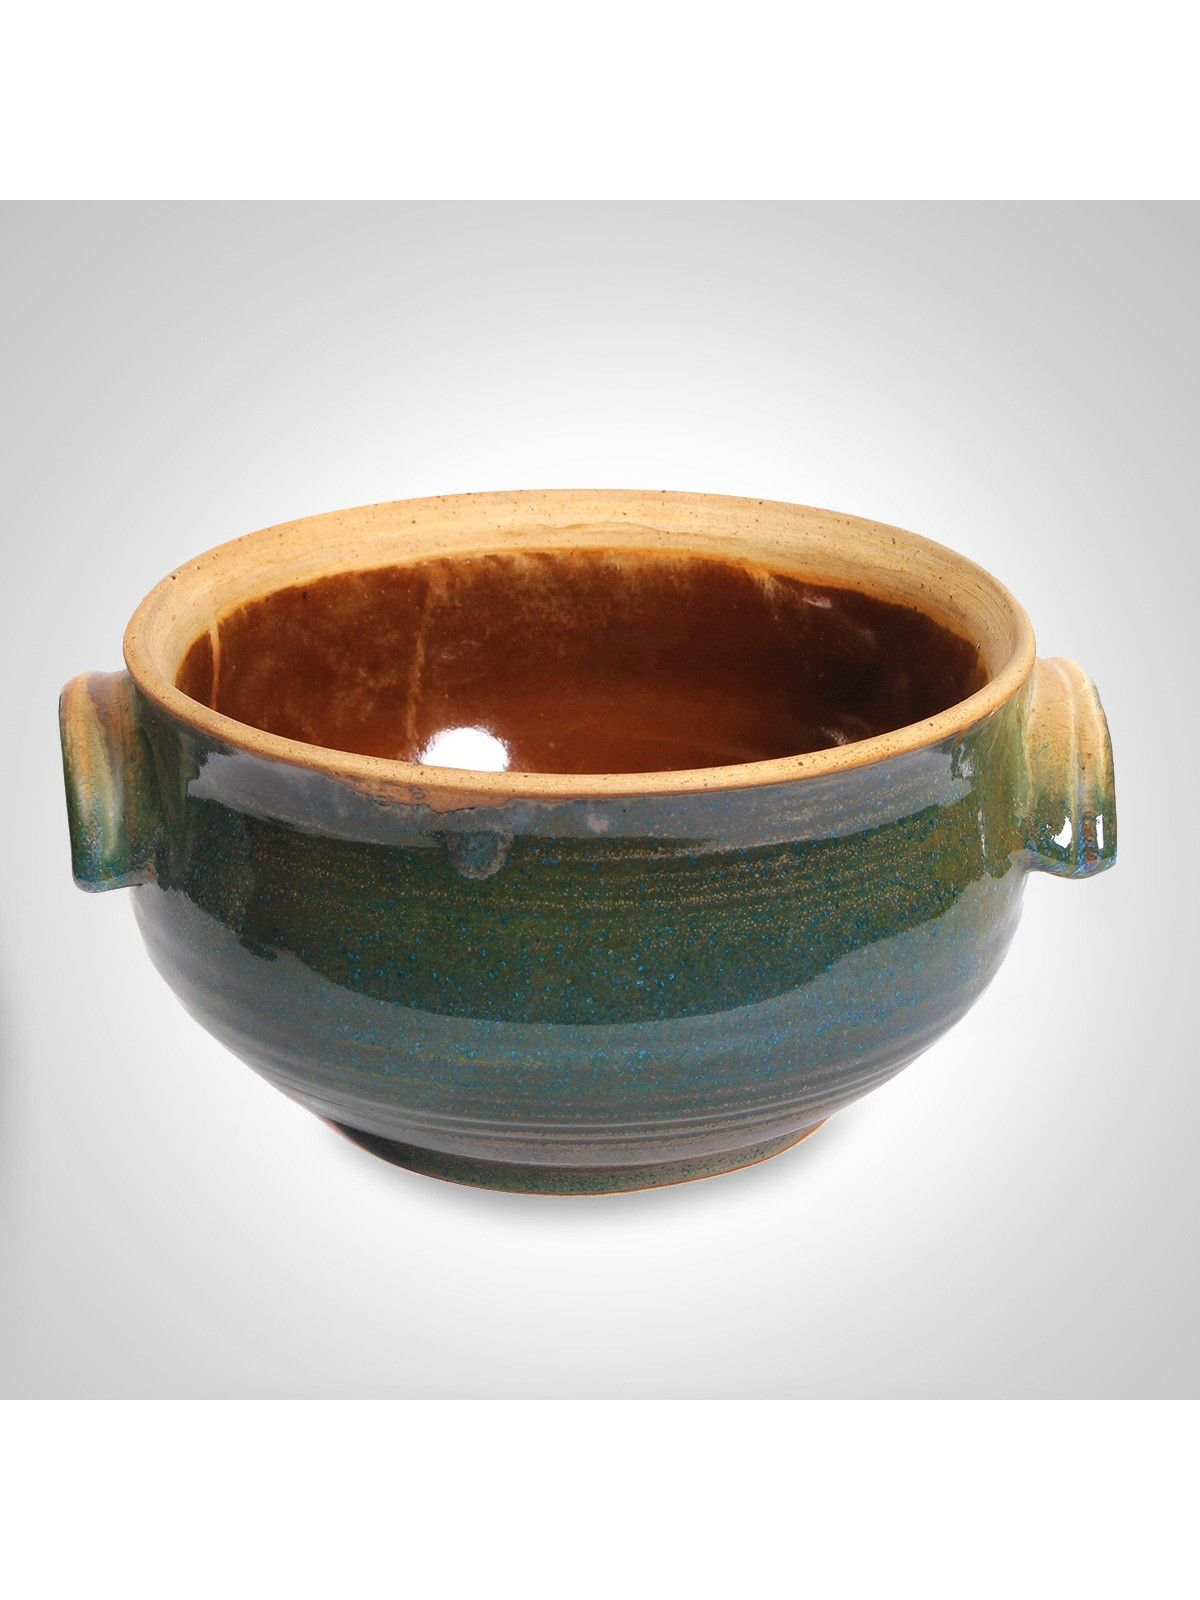 Sea moss ceramic serveware